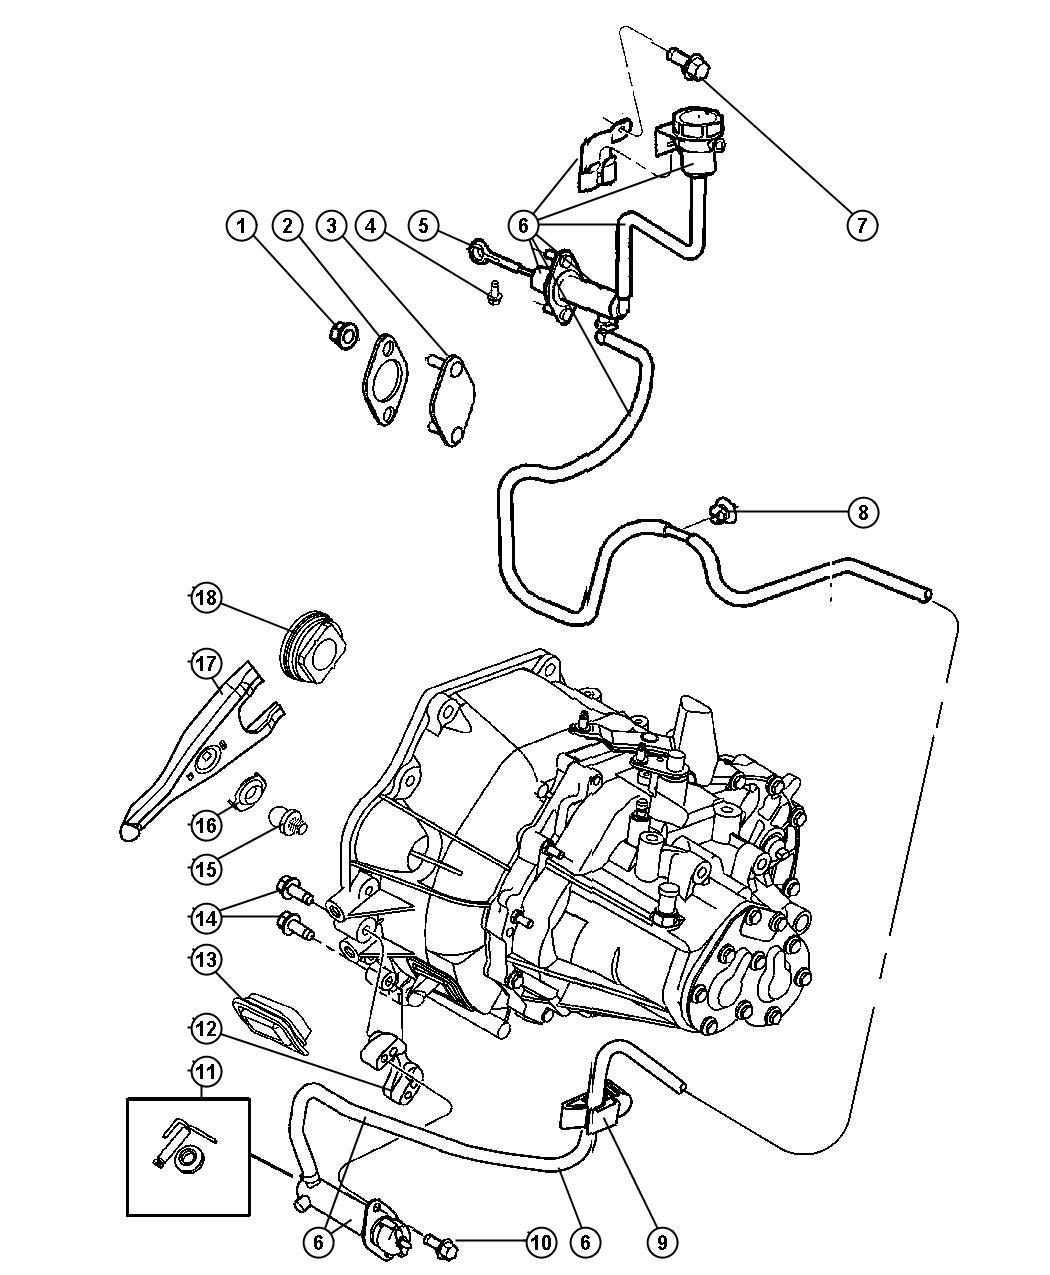 2006 pt cruiser engine diagram small sailboat wiring rear suspension imageresizertool com